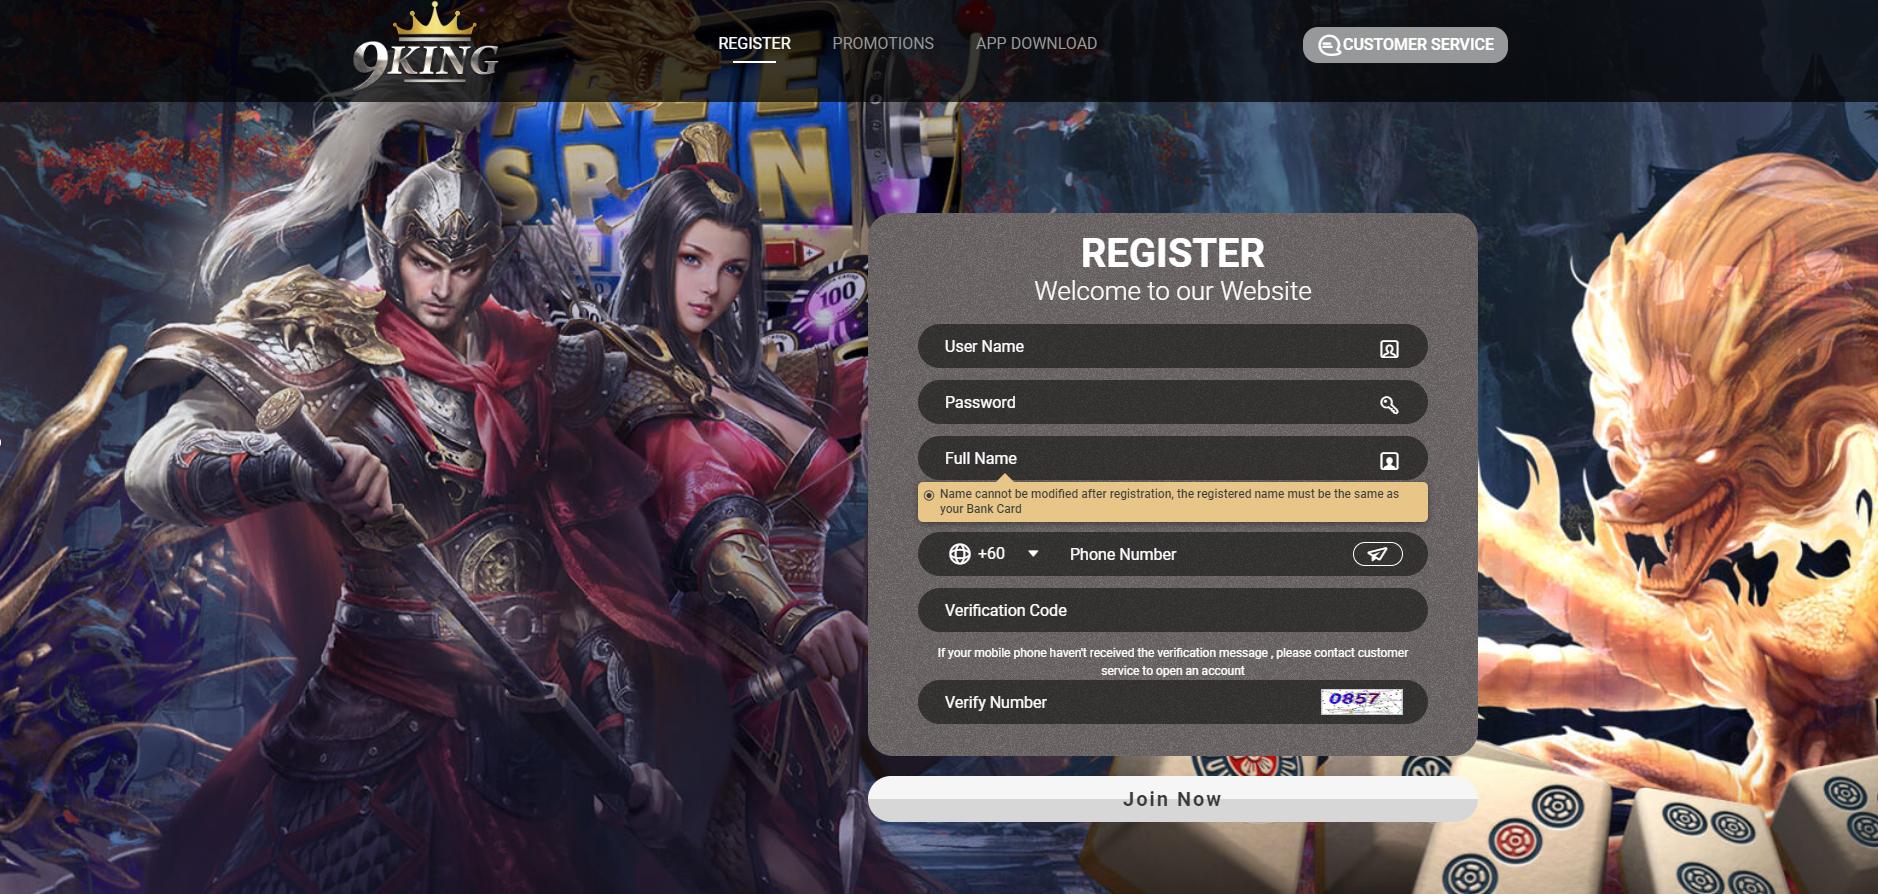 9KING Malaysia No.1 Online Casino App Live,Slots,Sports